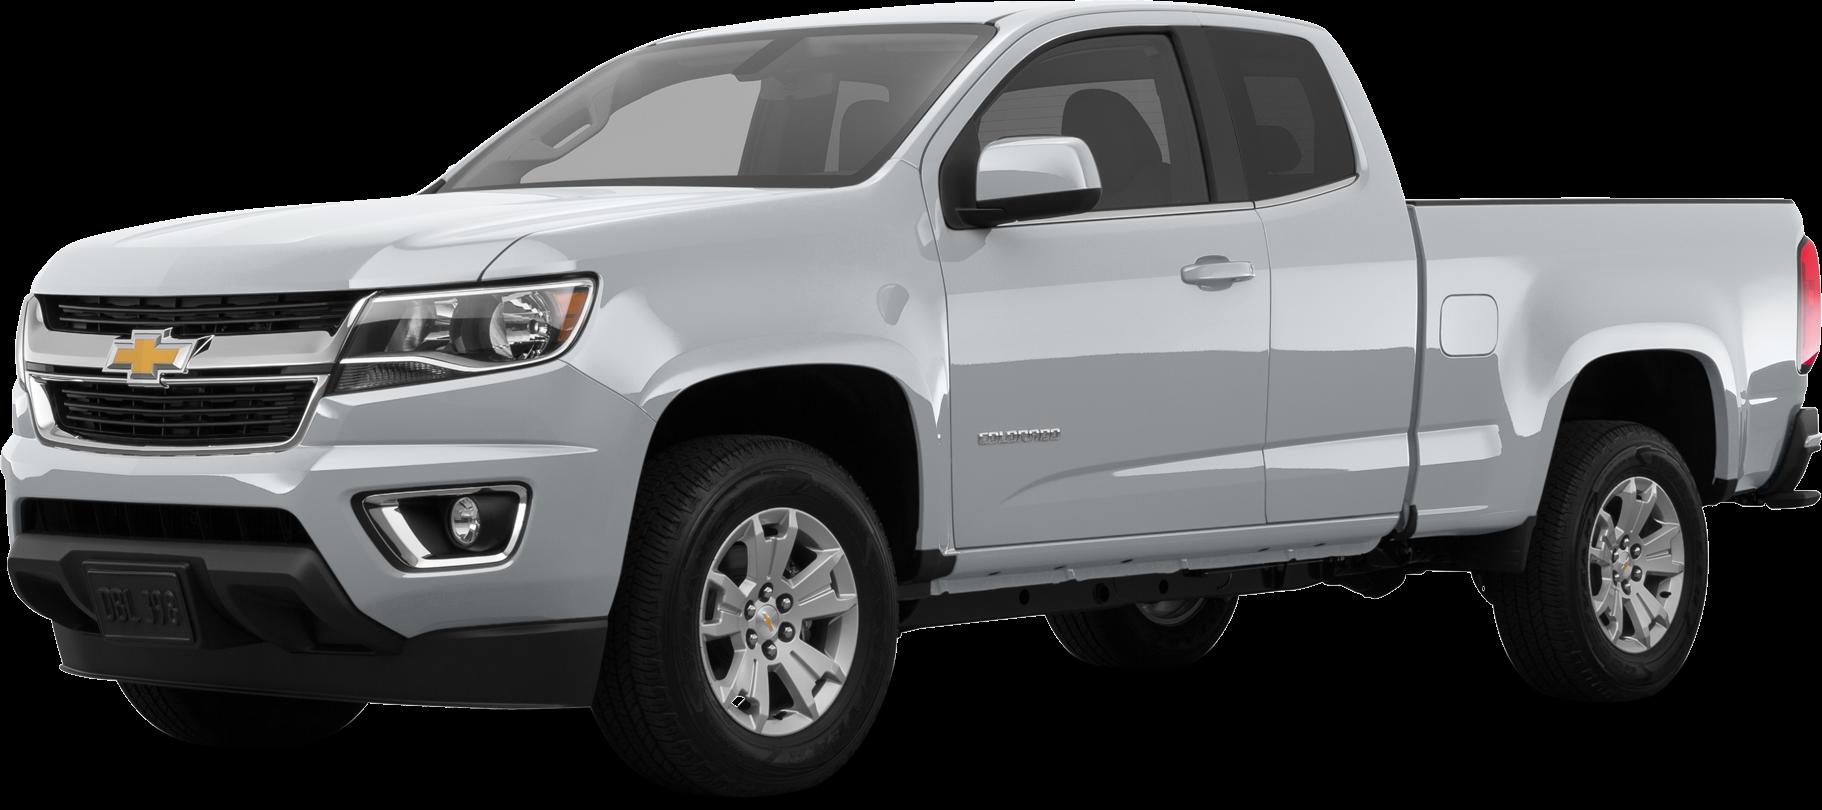 2017 Chevrolet Colorado Values Cars For Sale Kelley Blue Book